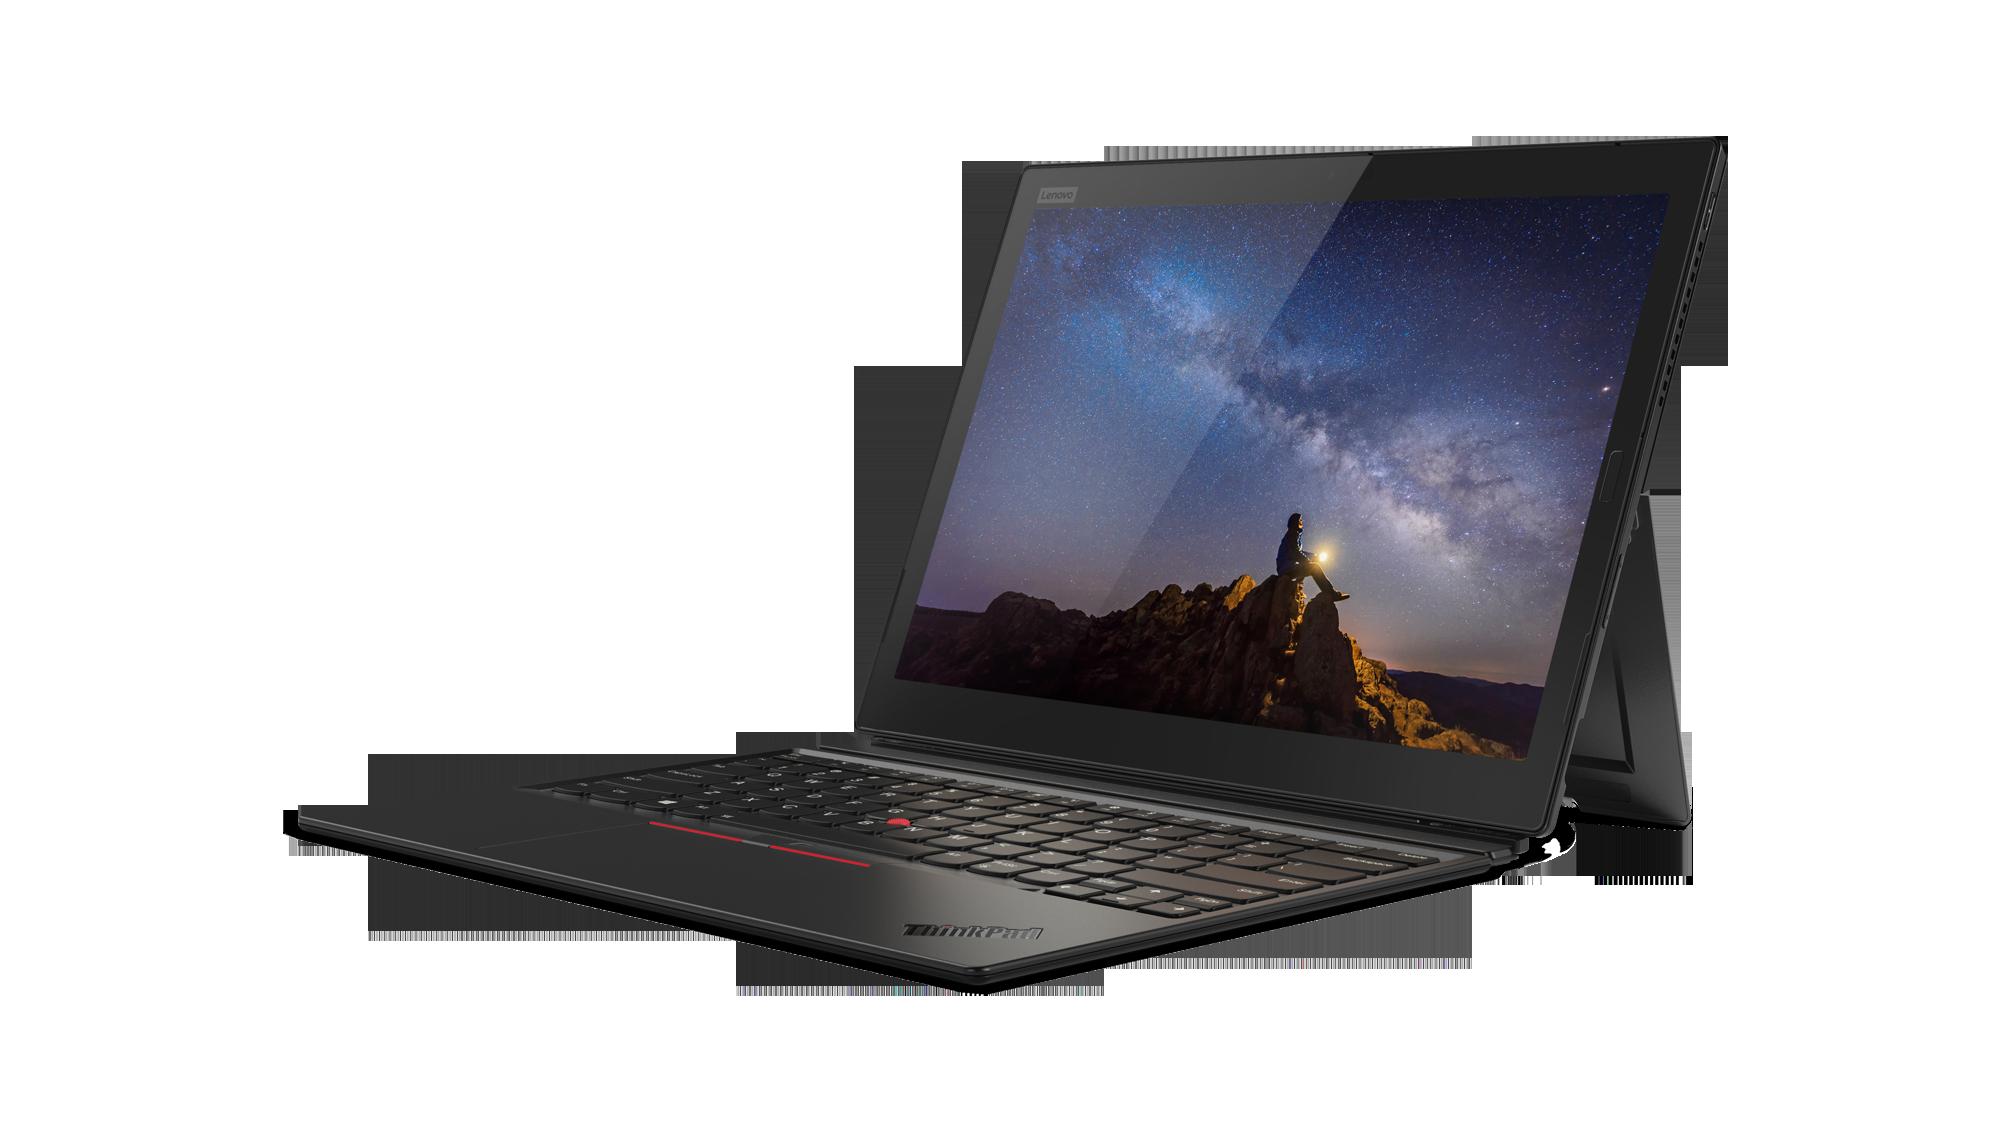 Lenovo ThinkPad X1 Tablet 3a generazione (11)